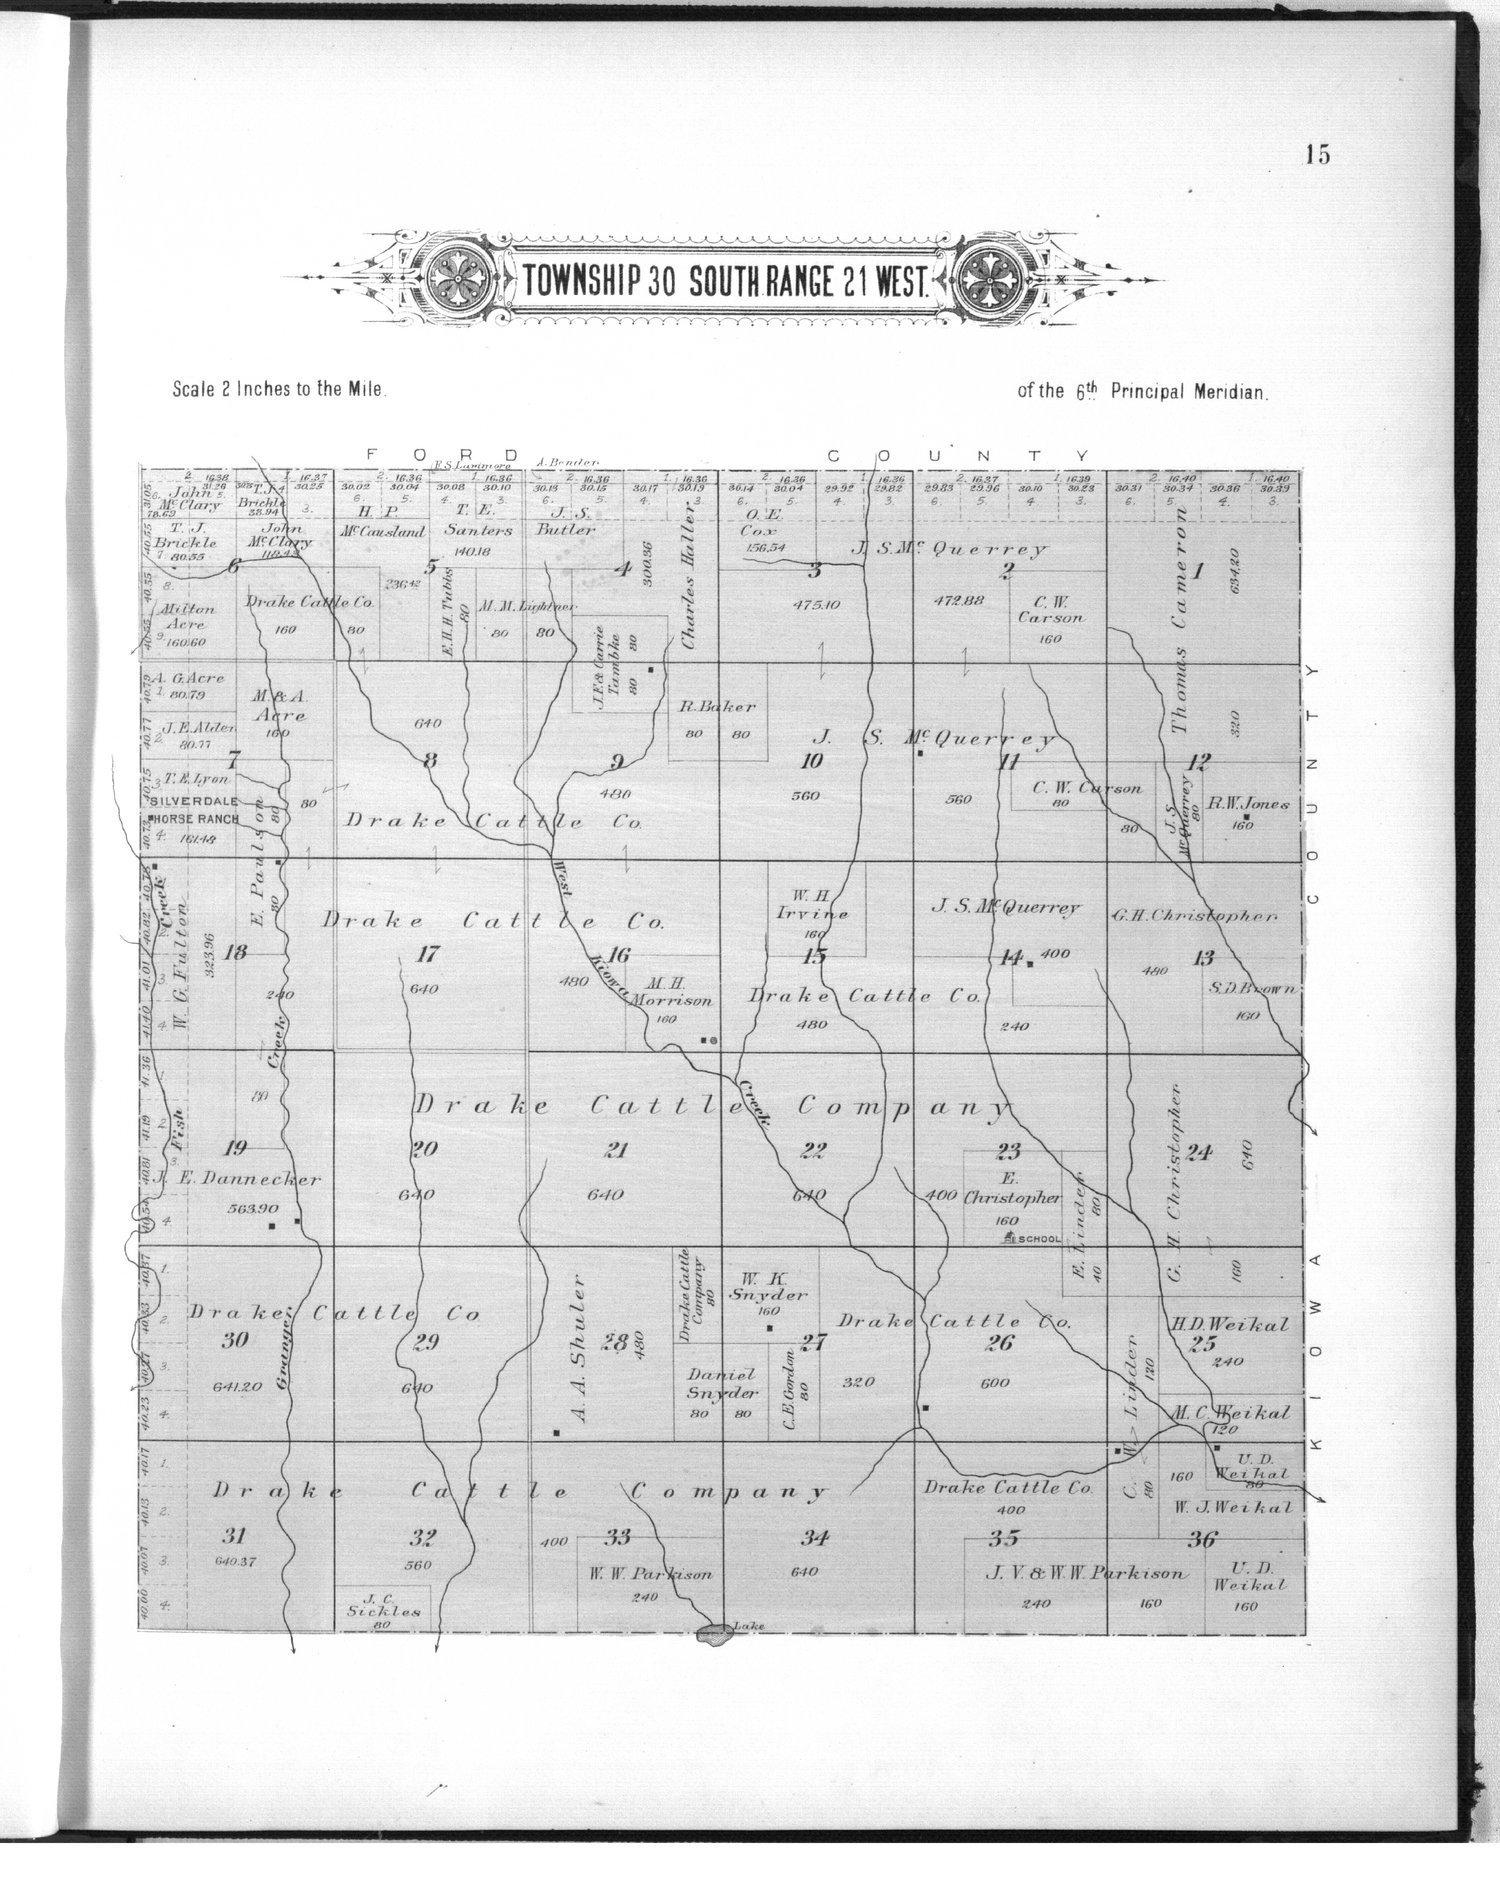 Plat book of Clark County, Kansas - 15